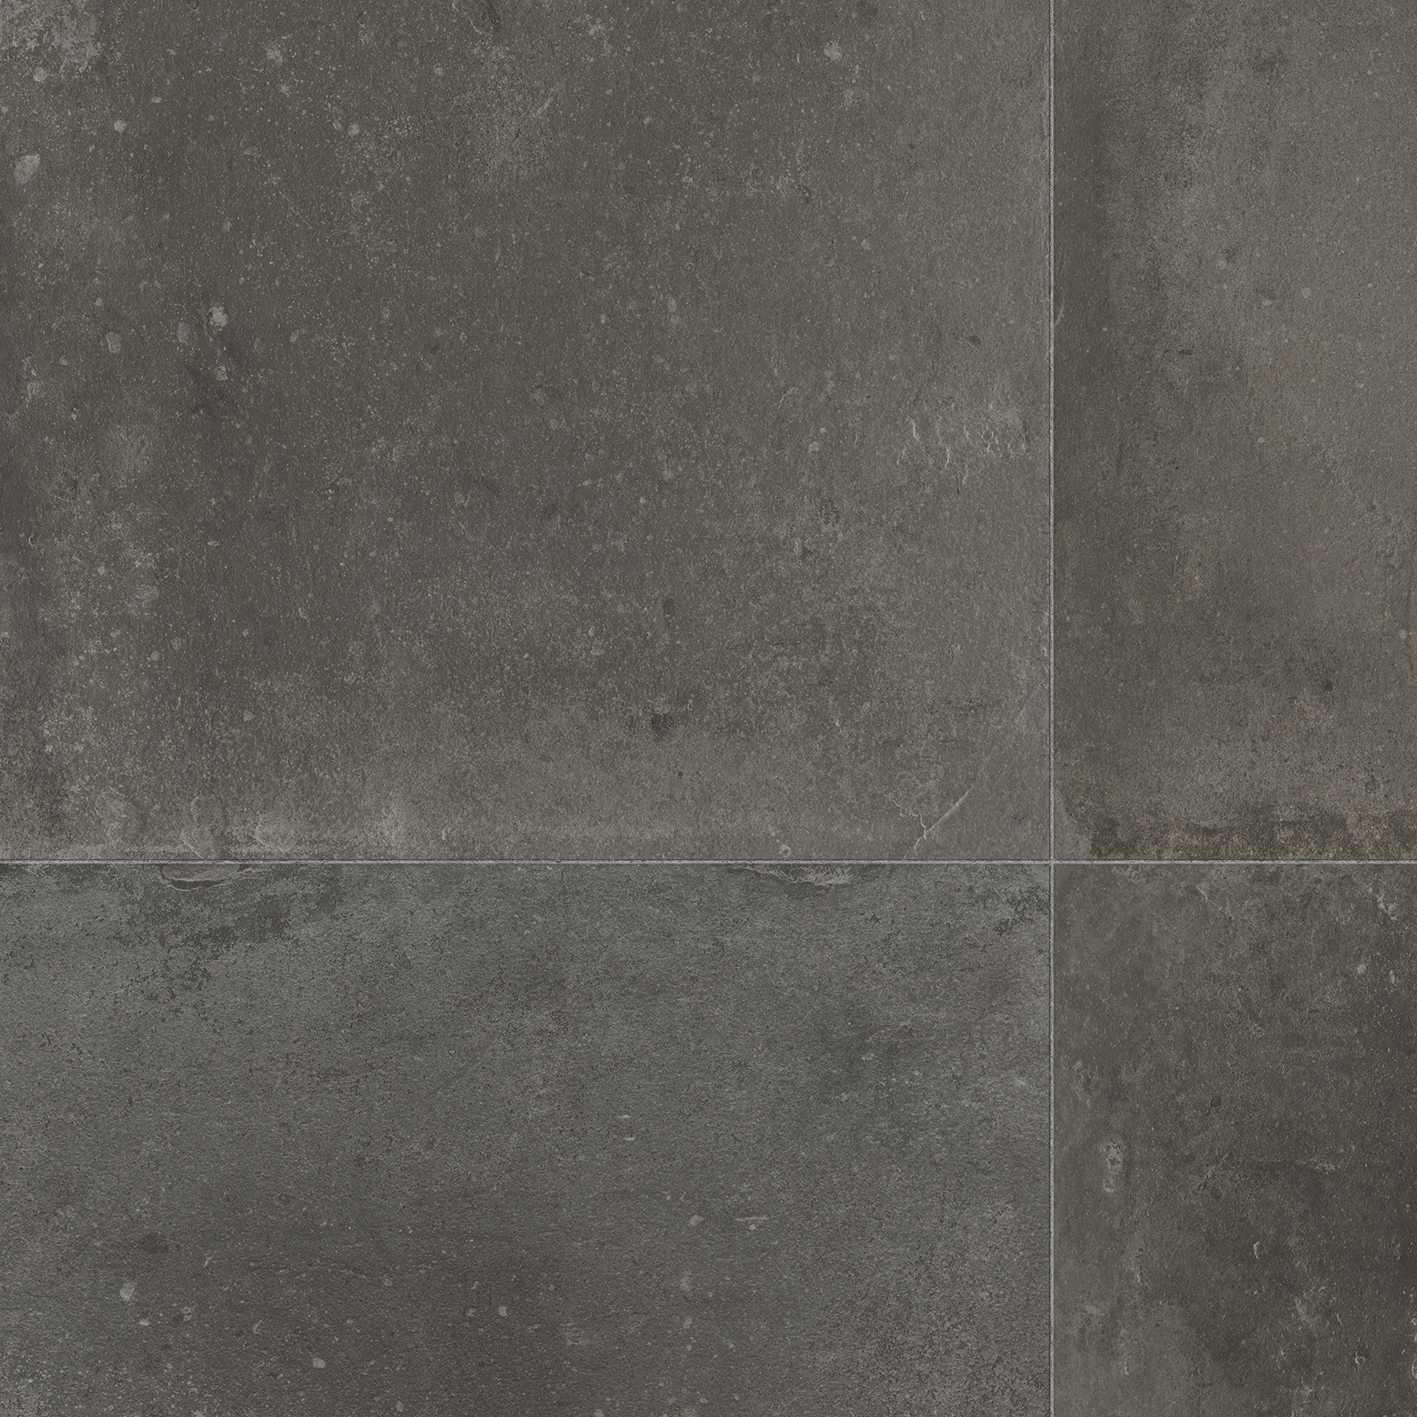 Pvc Gerflor Texline Etna dark grey 2098